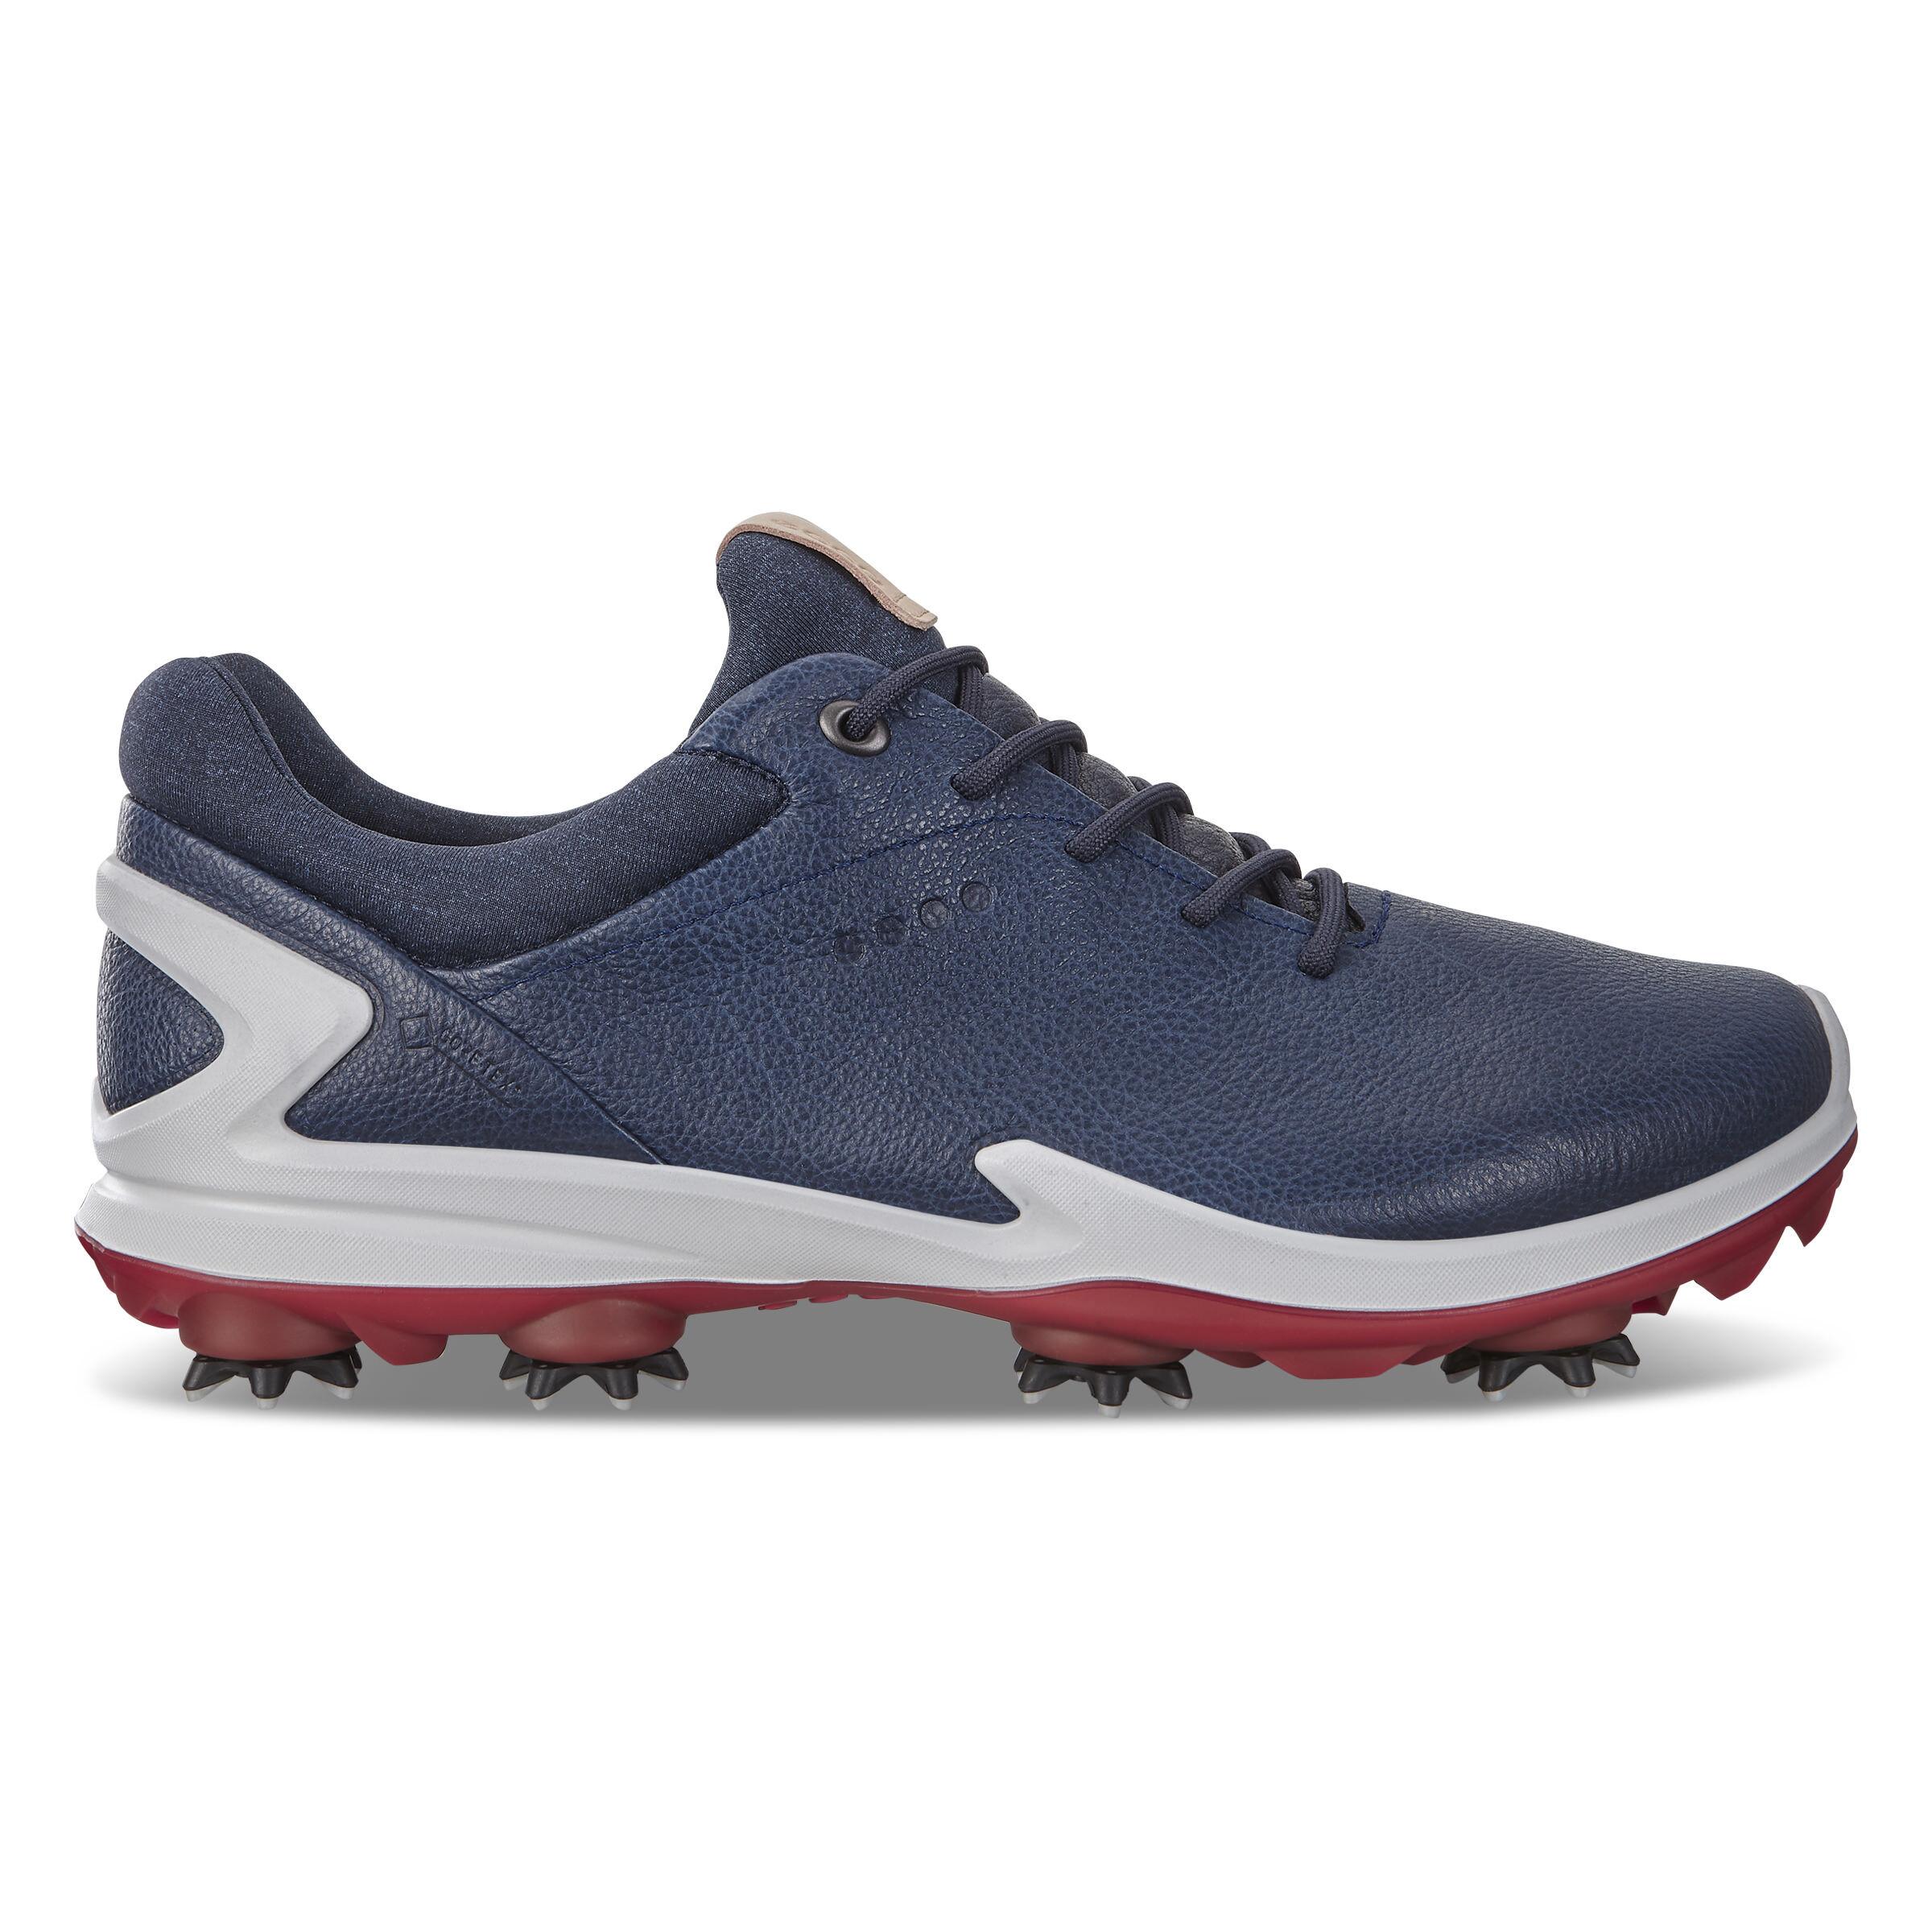 Men's BIOM Golf Shoes | ECCO® Shoes